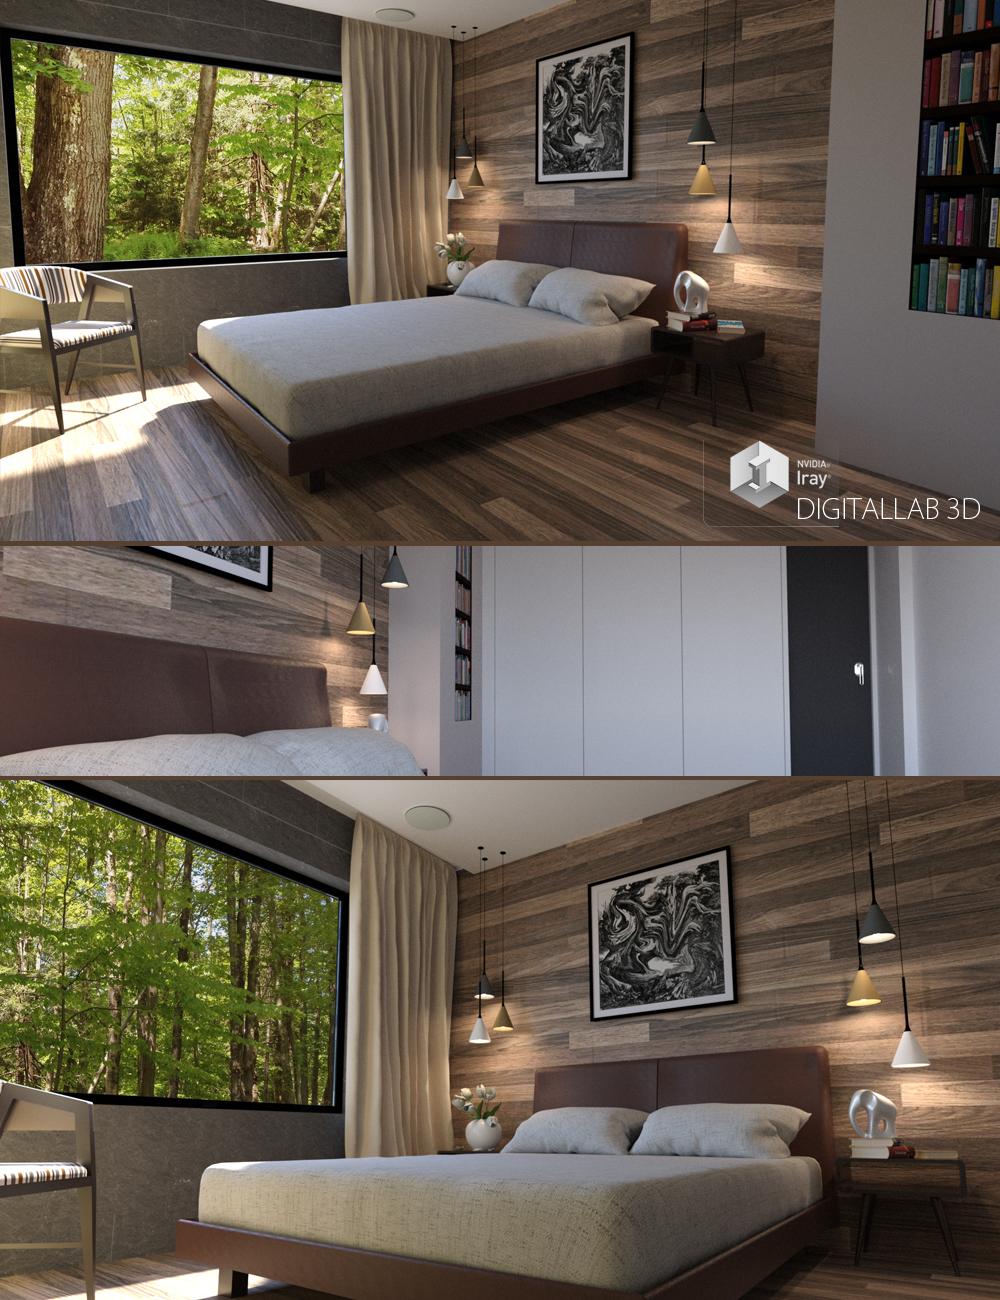 Euro Bedroom by: Digitallab3D, 3D Models by Daz 3D